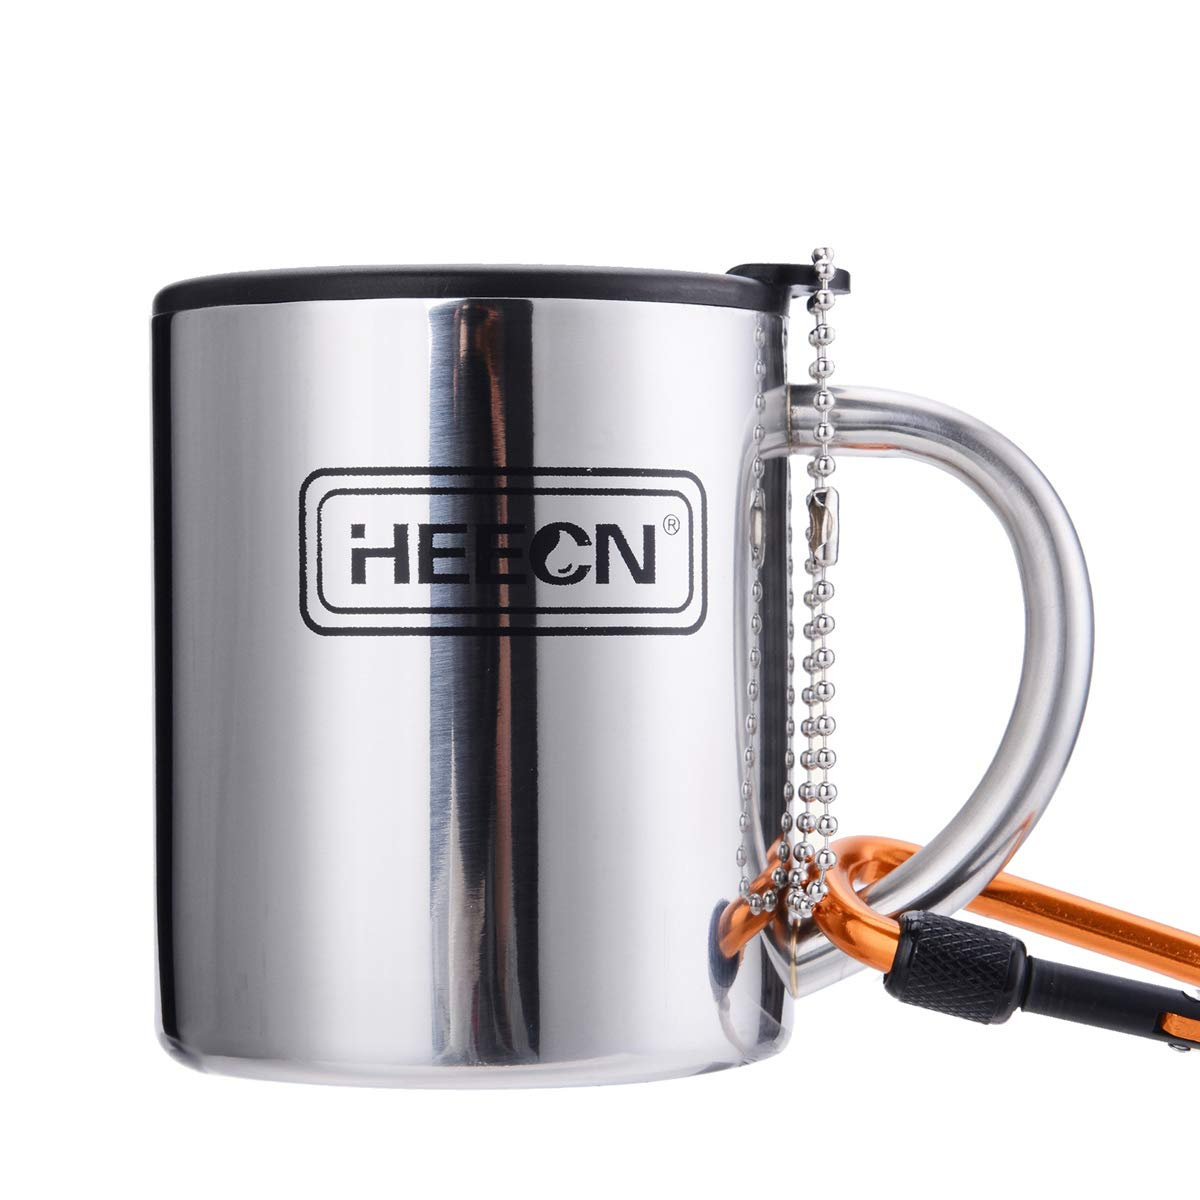 HEECN Camping Coffee Mug with Lid 220ml 300ml 450ml HESS038BBK